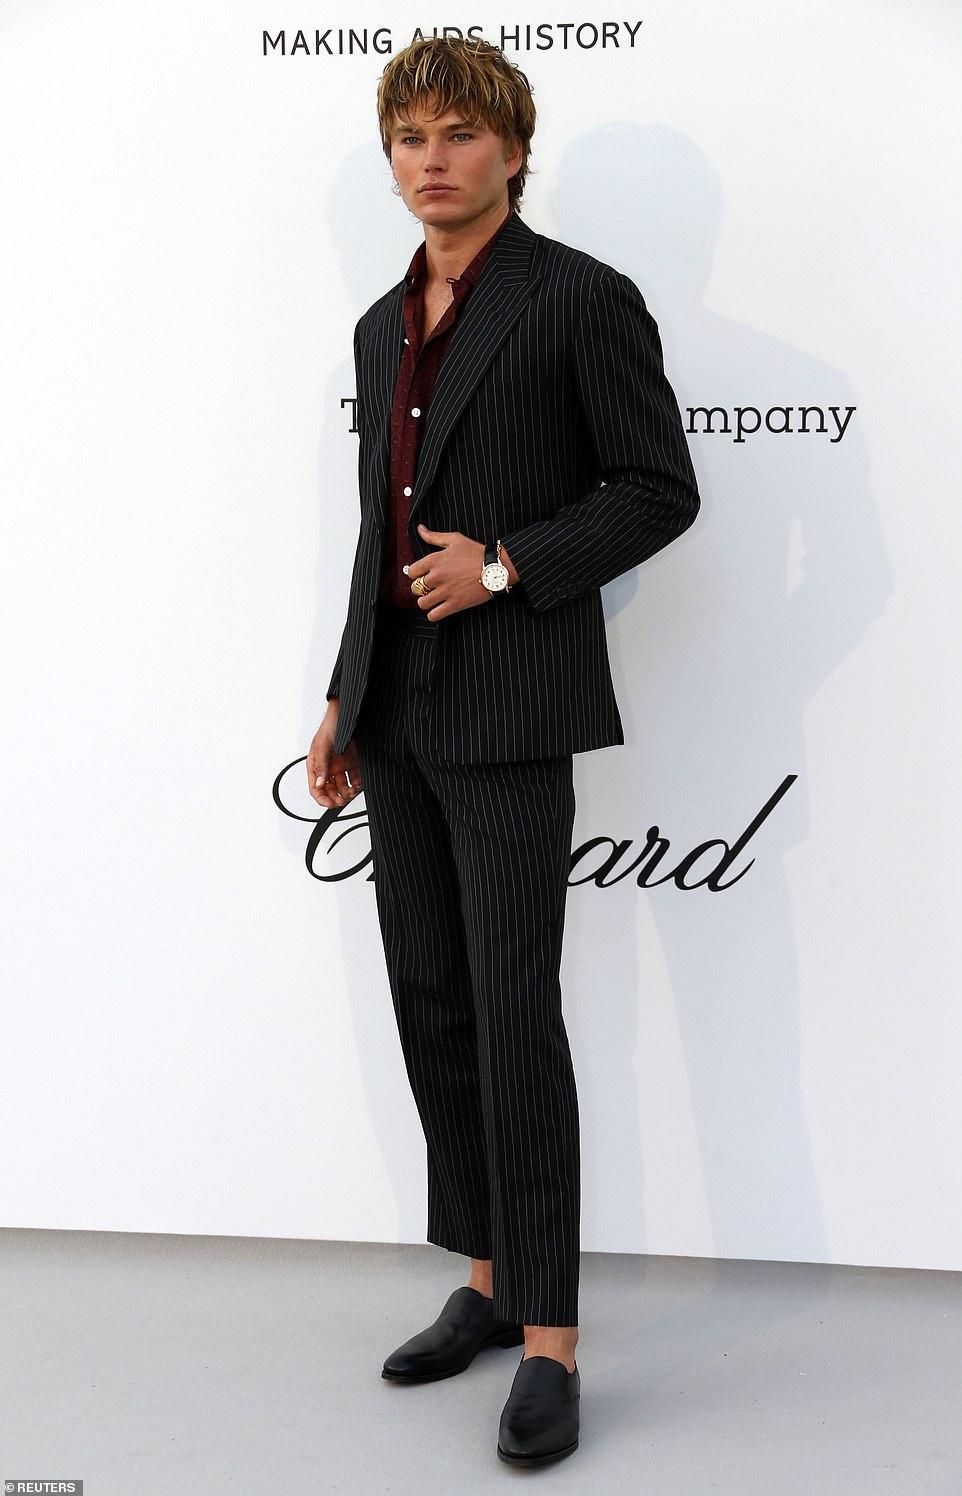 Hunk: Jordan Barrett looked fantastic in a pinstripe black suit and burgundy top